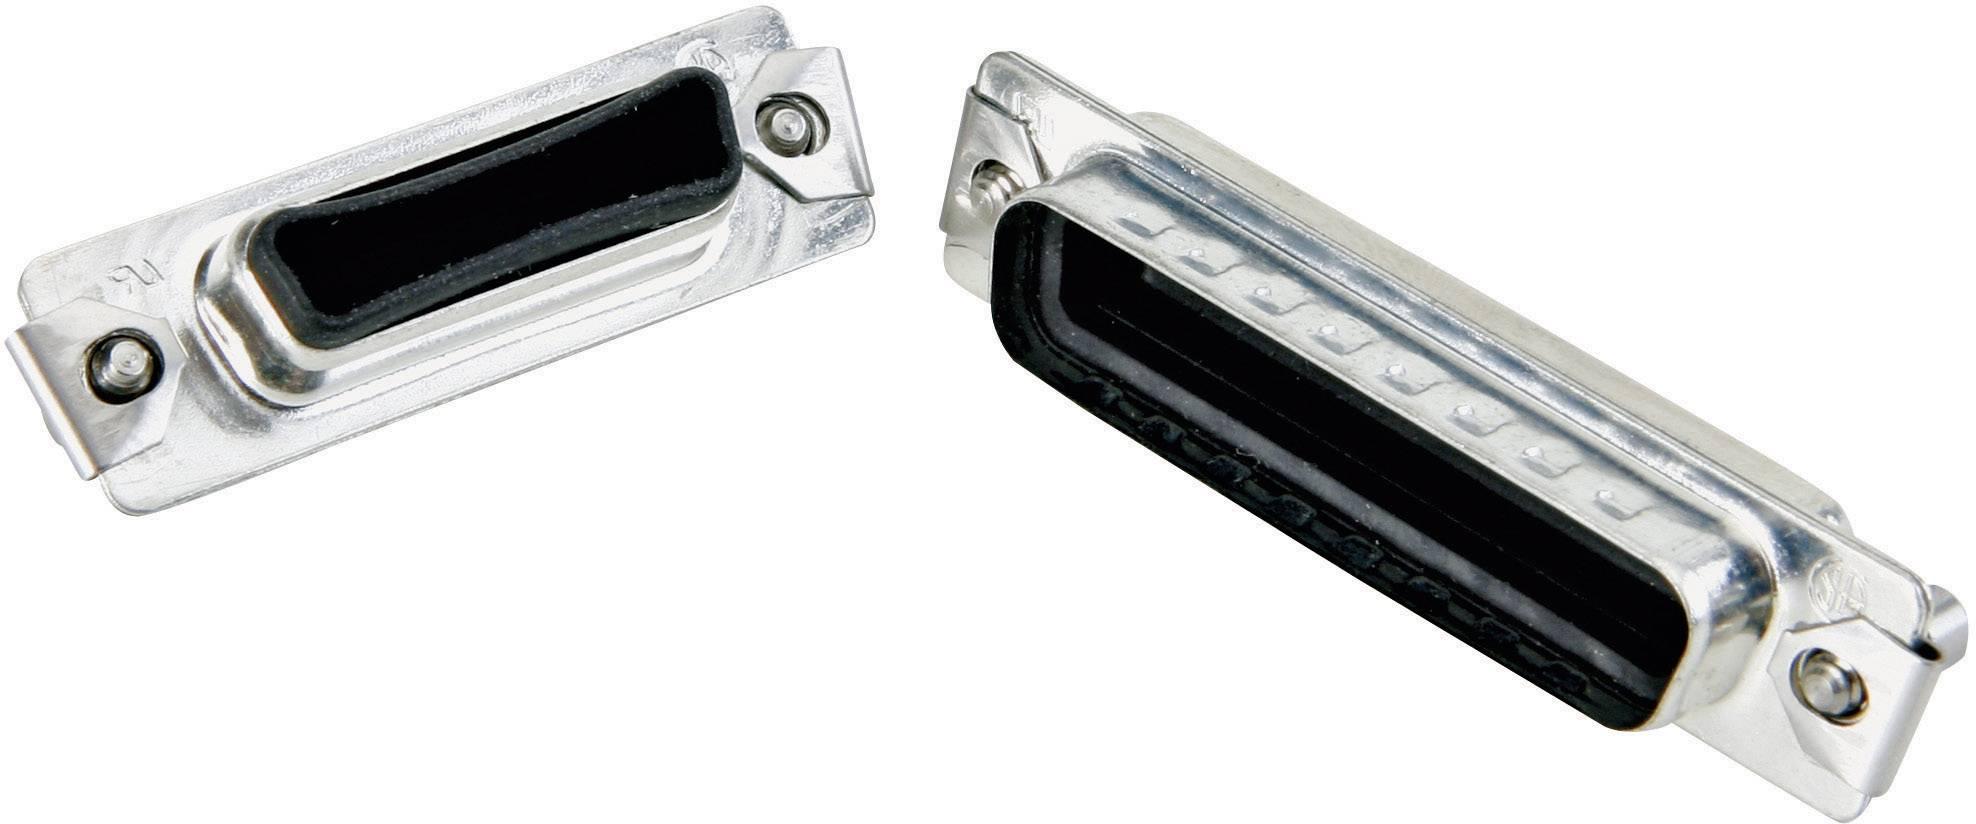 D-SUB krytka IP67 pro D-SUB zásuvka 15pólová Conec 165X14729X, 165X14729X, stříbrná, 1 ks